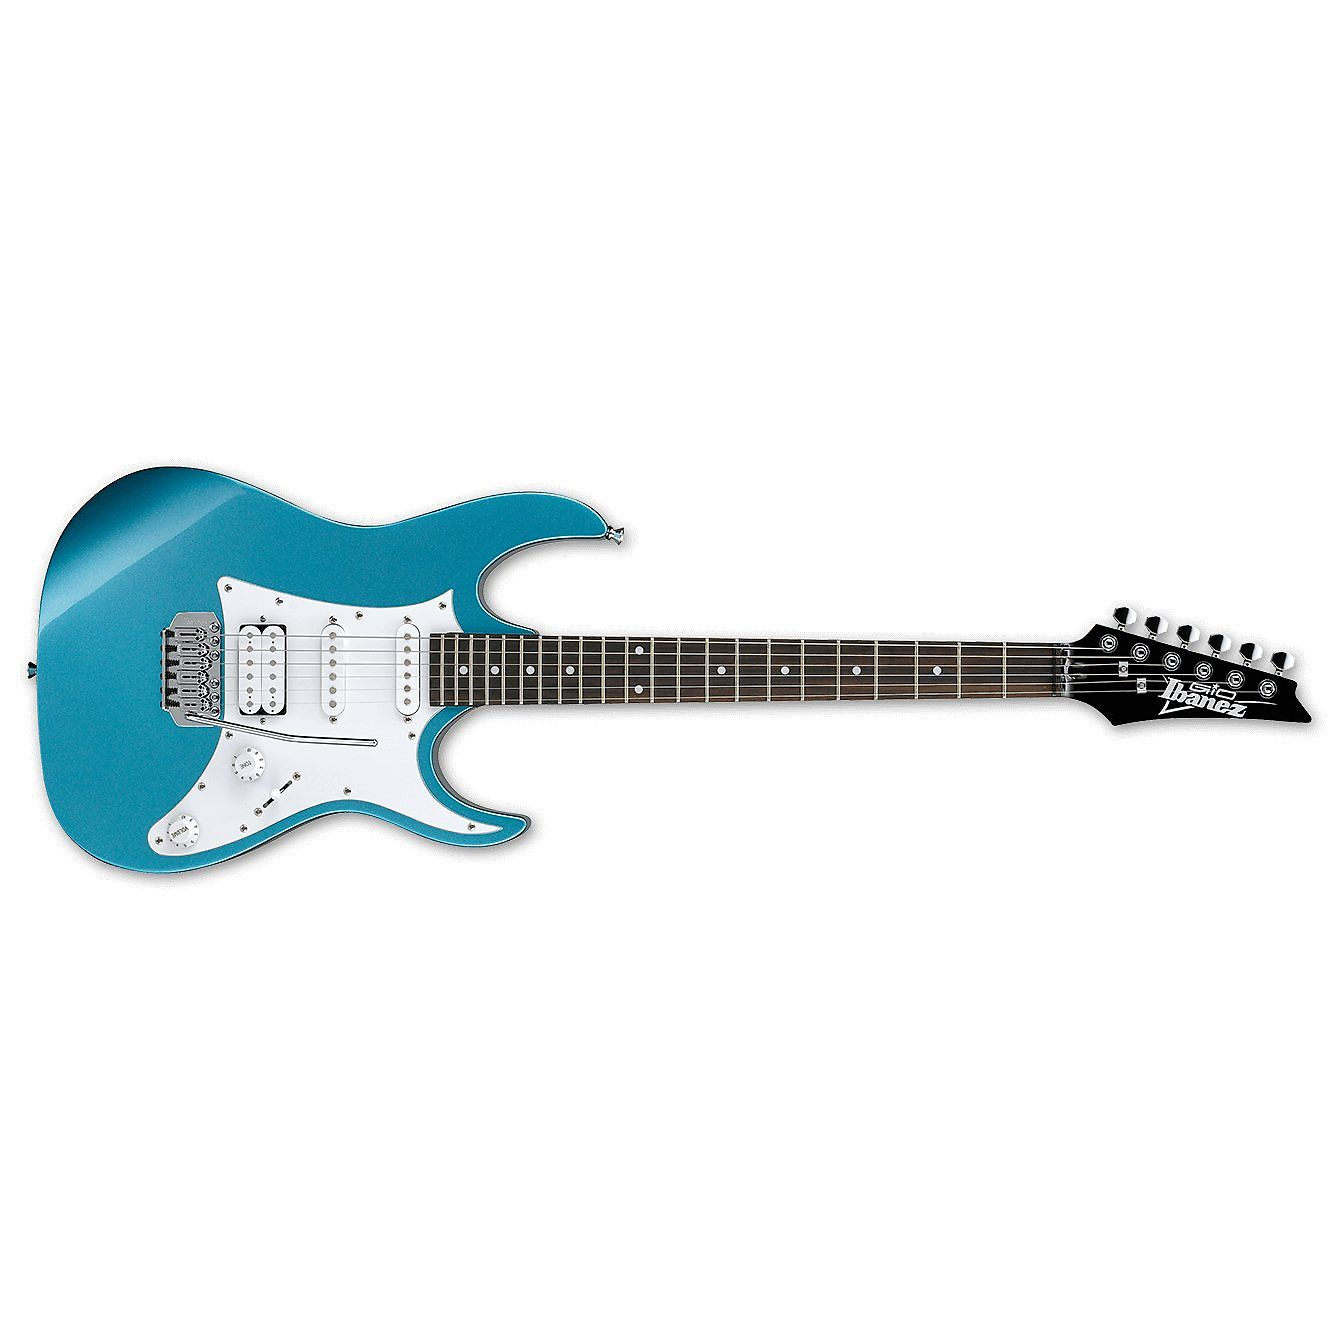 Ibanez Gio Grx40z Electric Guitar Metallic Light Blue